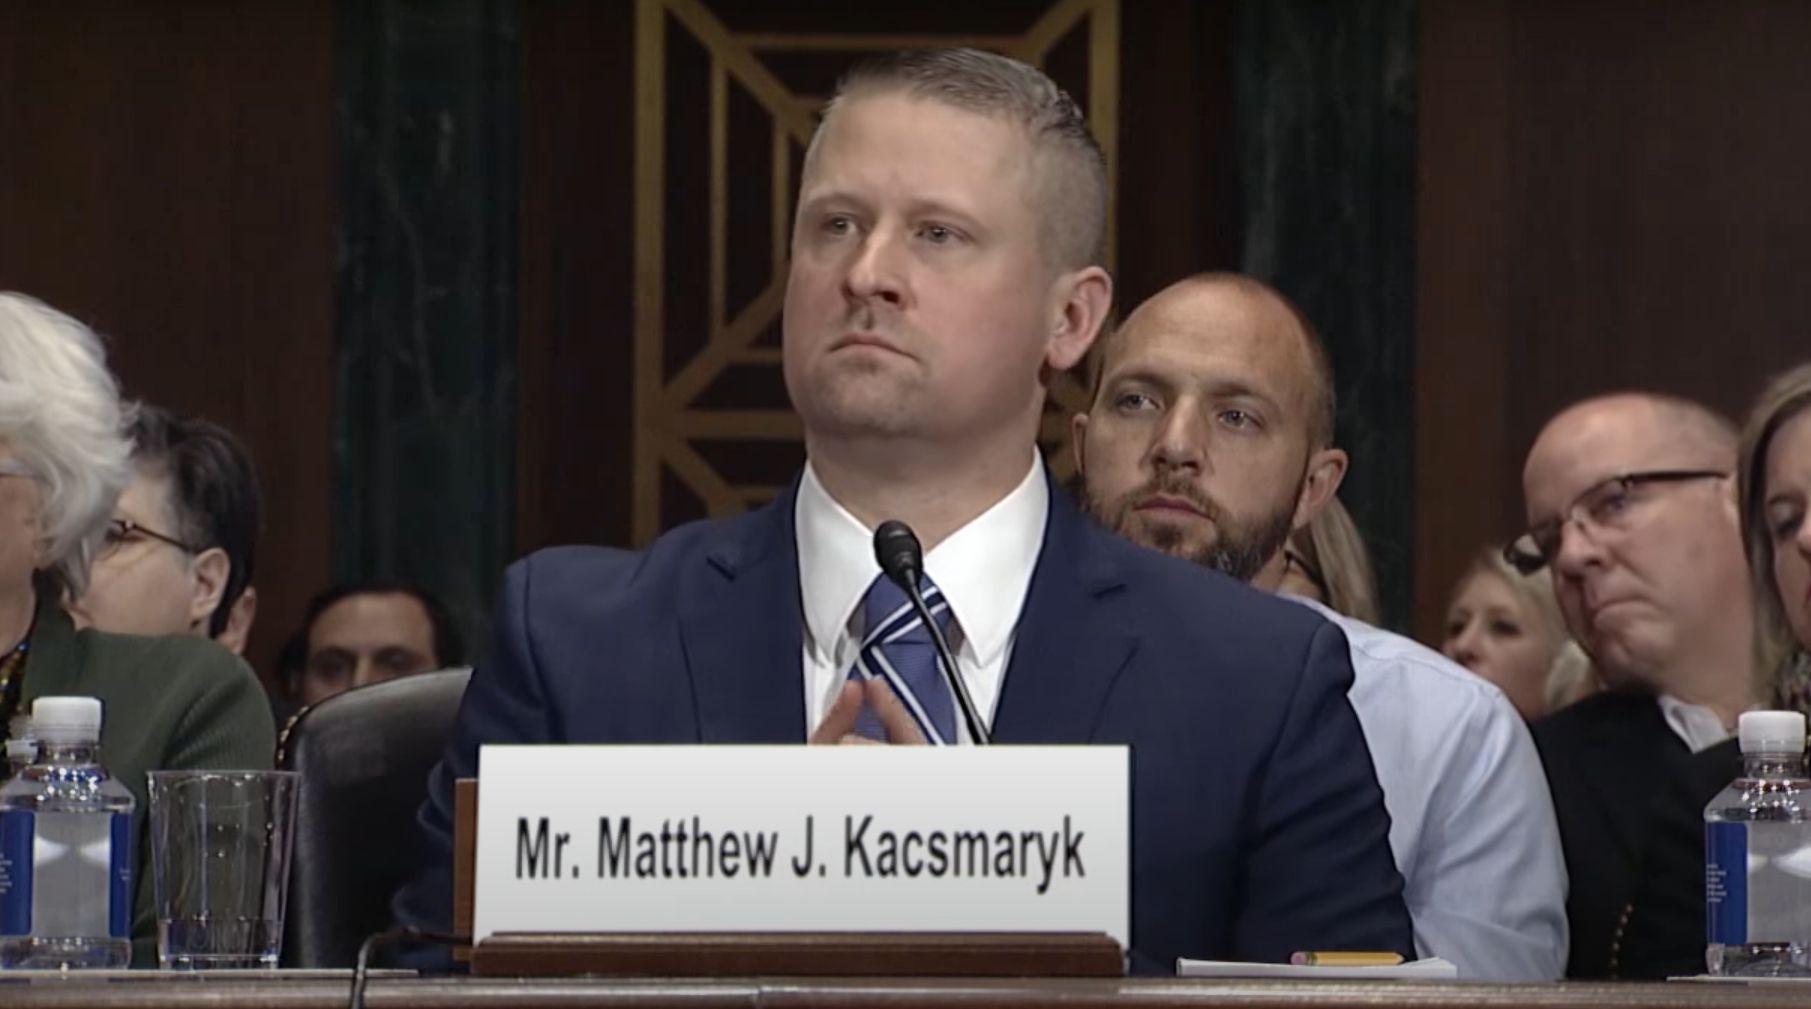 Matthew J. Kacsmaryk